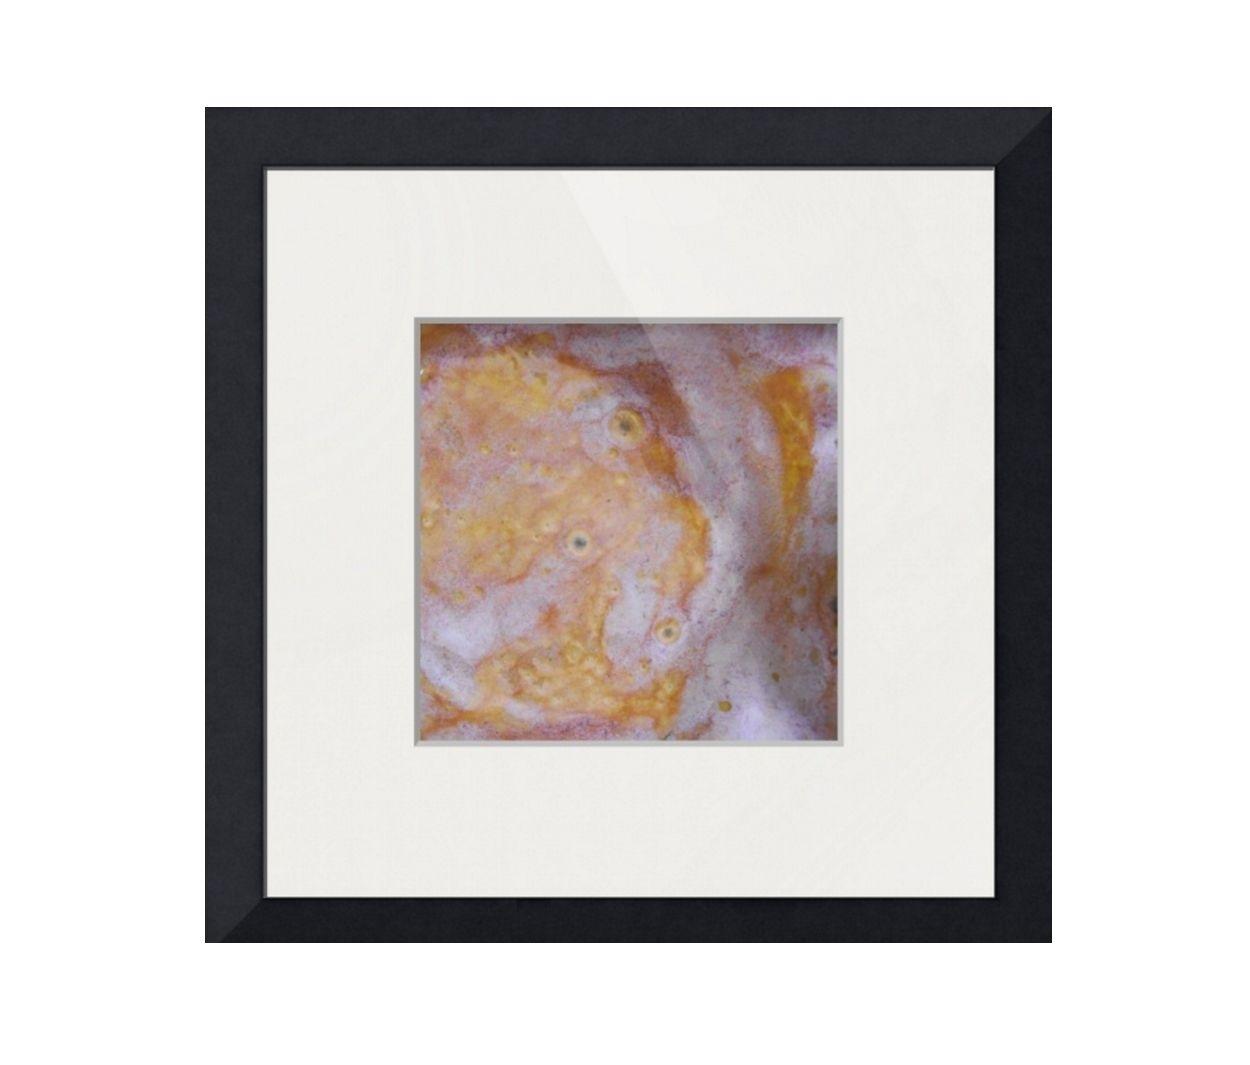 Orange Beige And White Modern Framed Prints | Rustic Artwork Inside Newest Contemporary Framed Art Prints (Gallery 6 of 15)